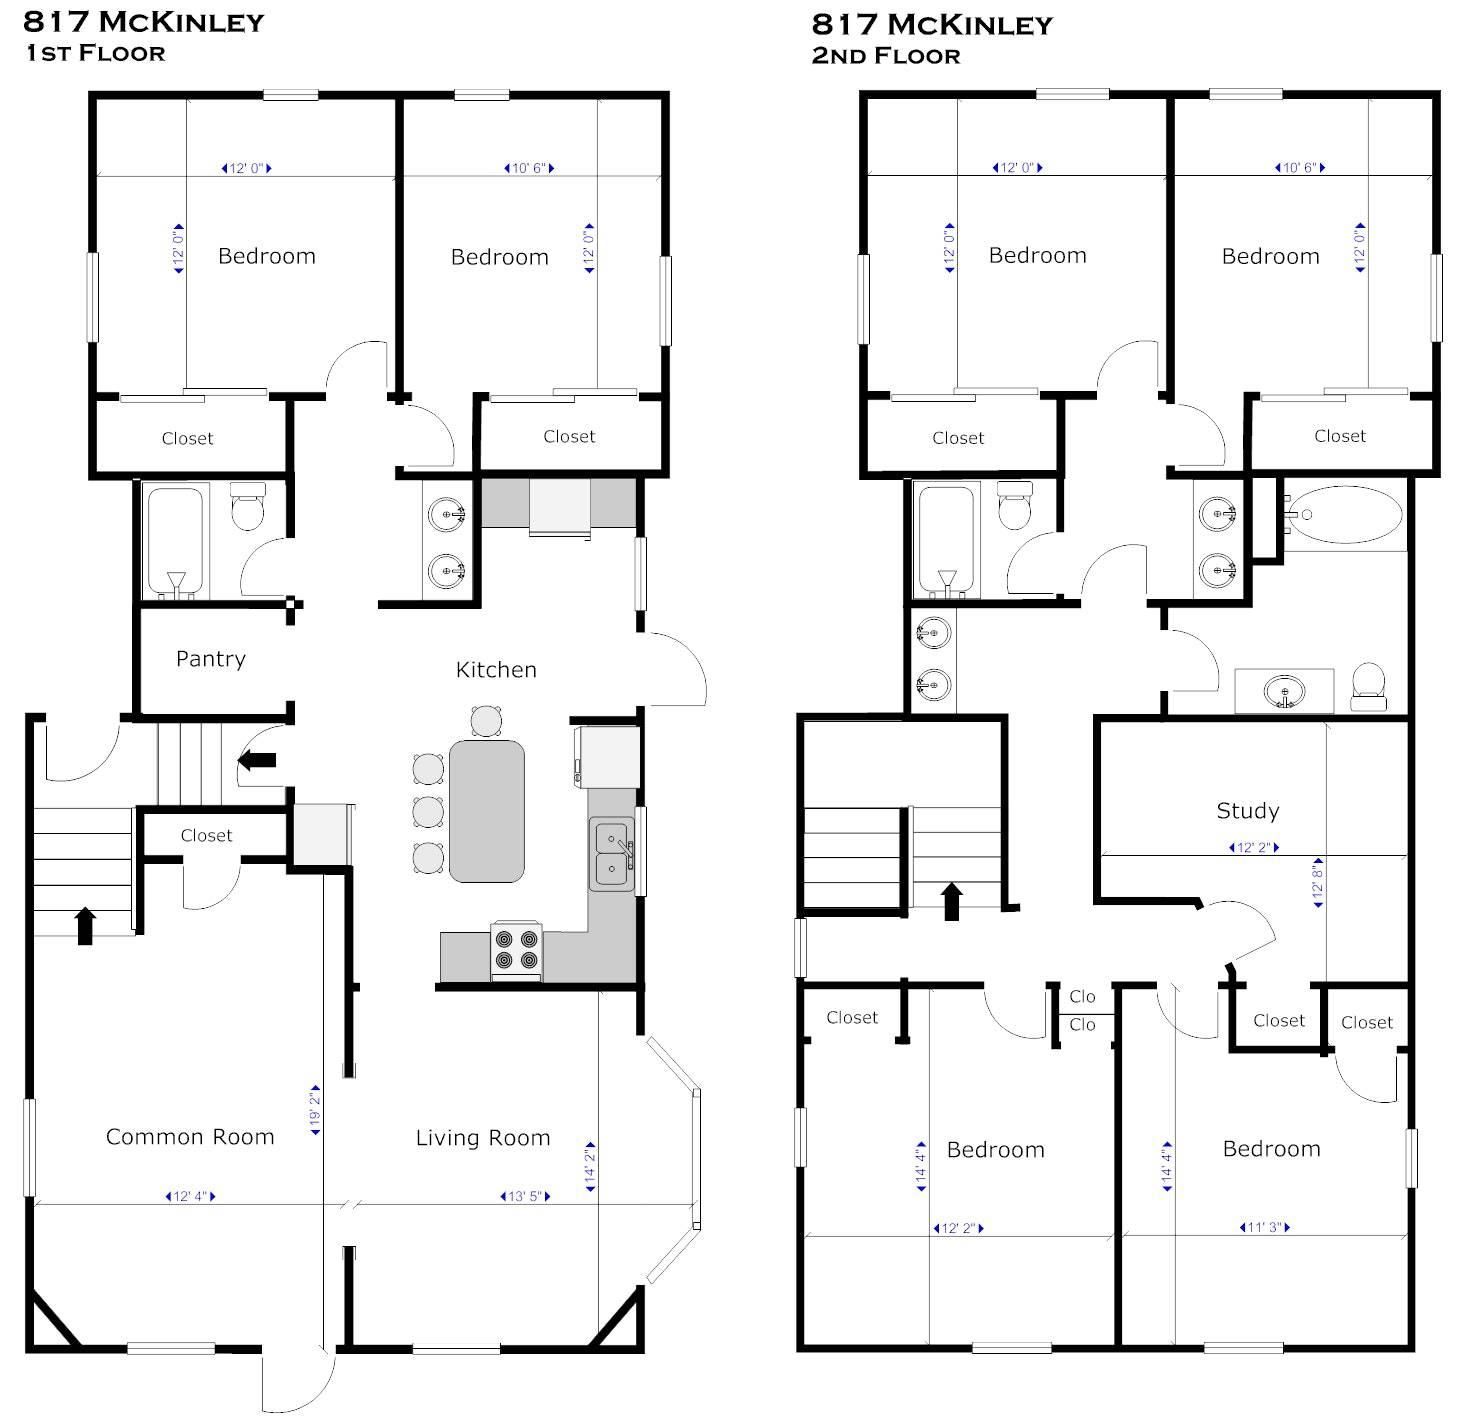 Modern Coffee Shop Floor Plan Design Elegant House Plans 178491